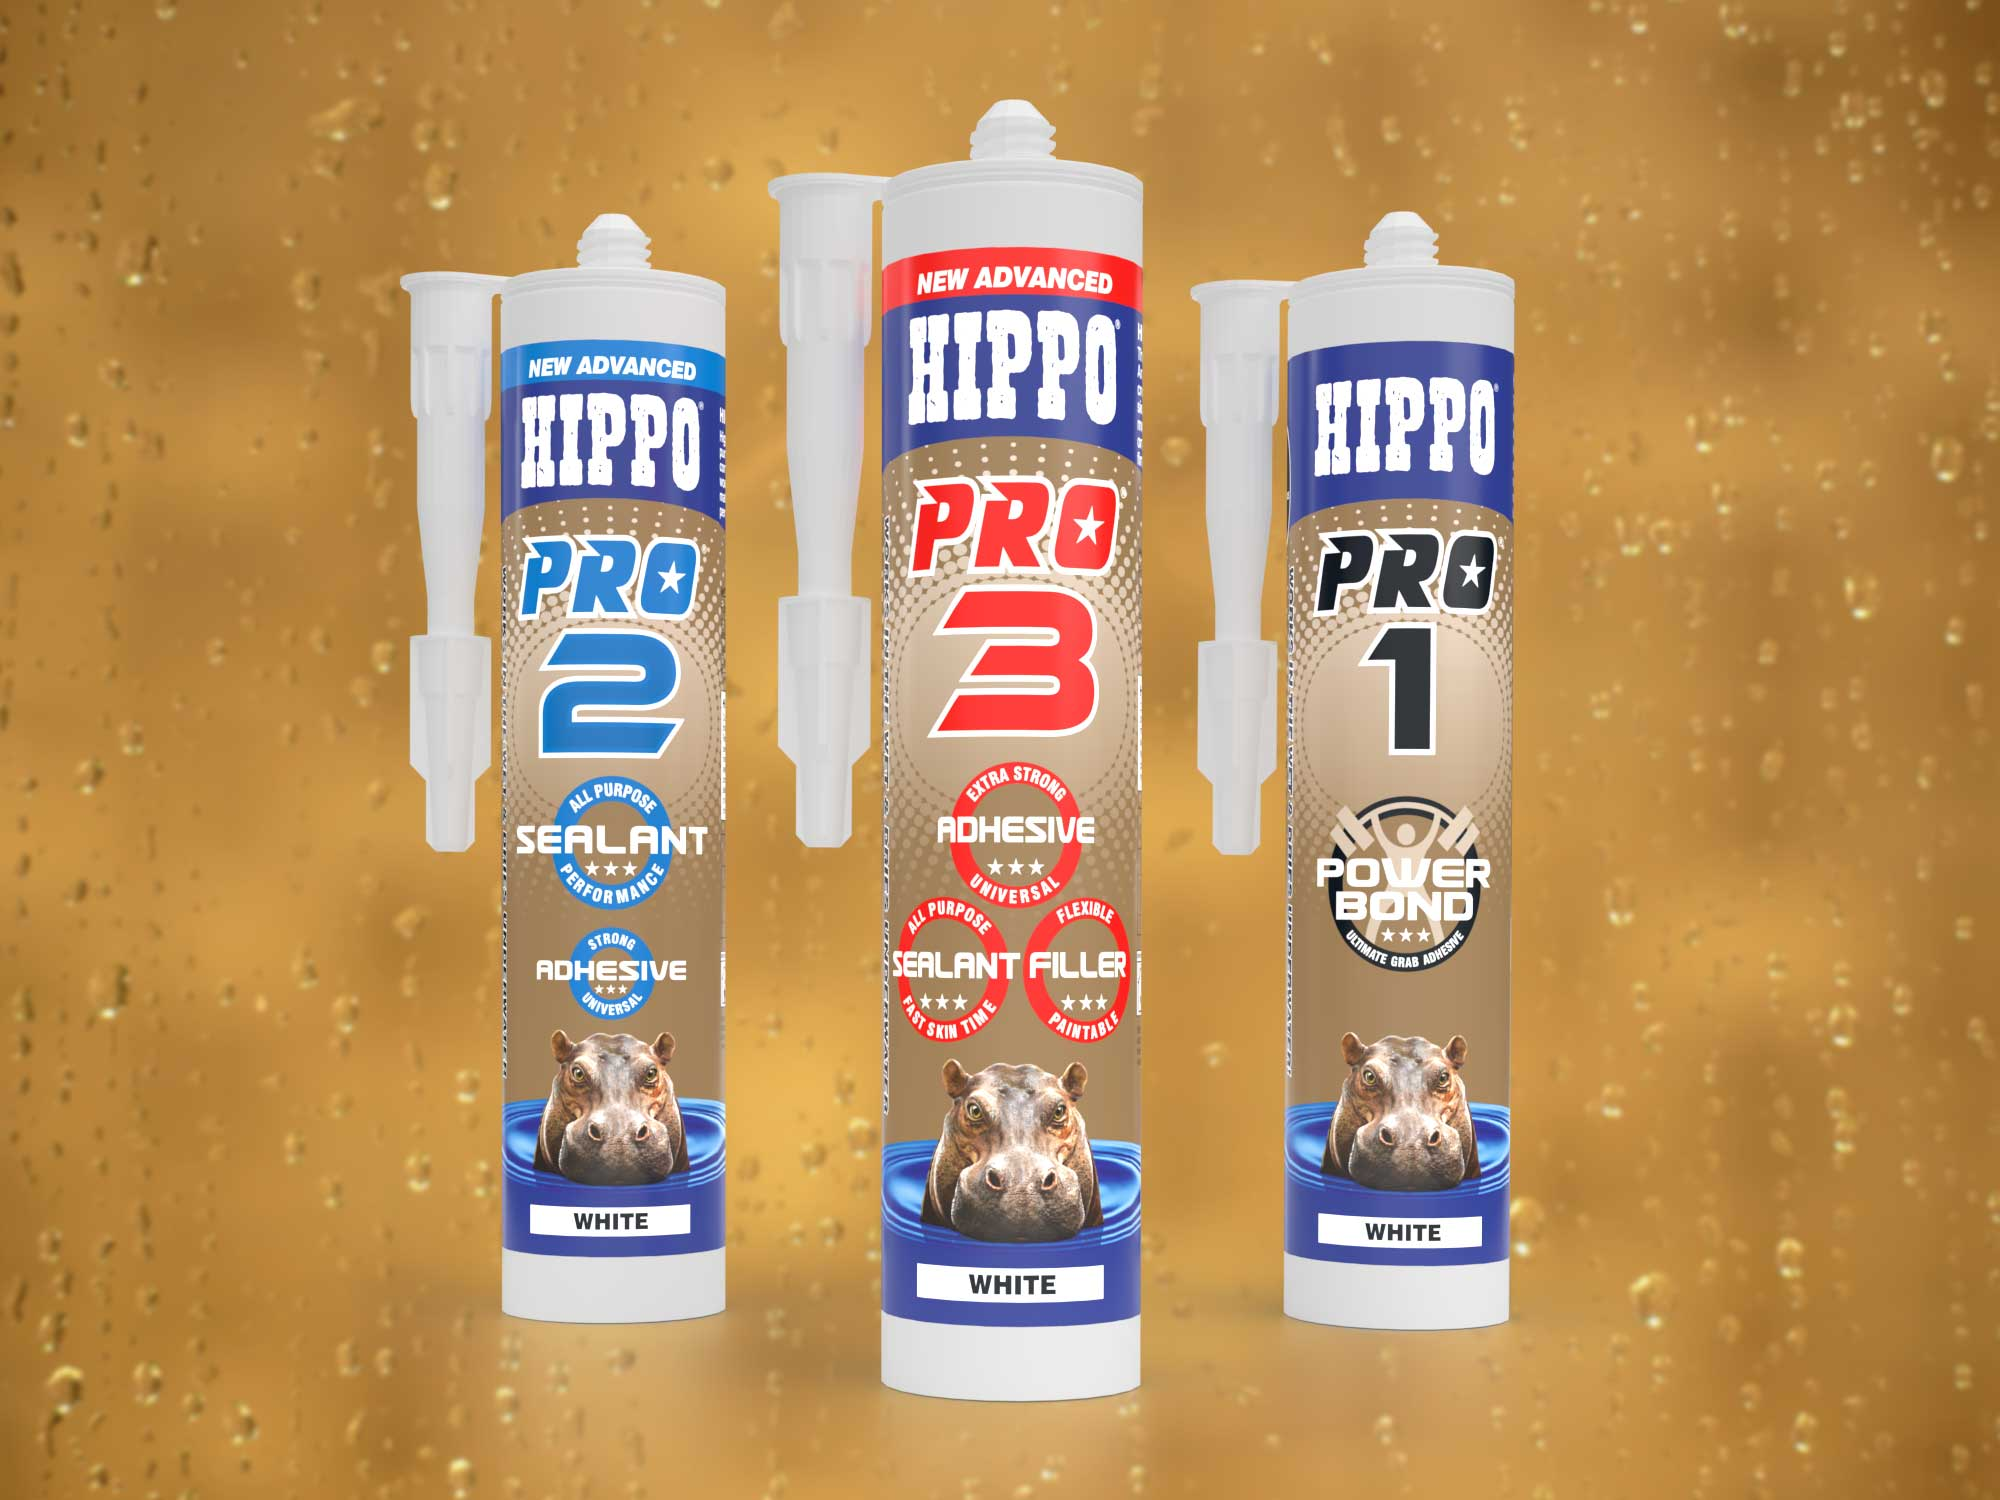 The New Advanced Hippo PRO Range